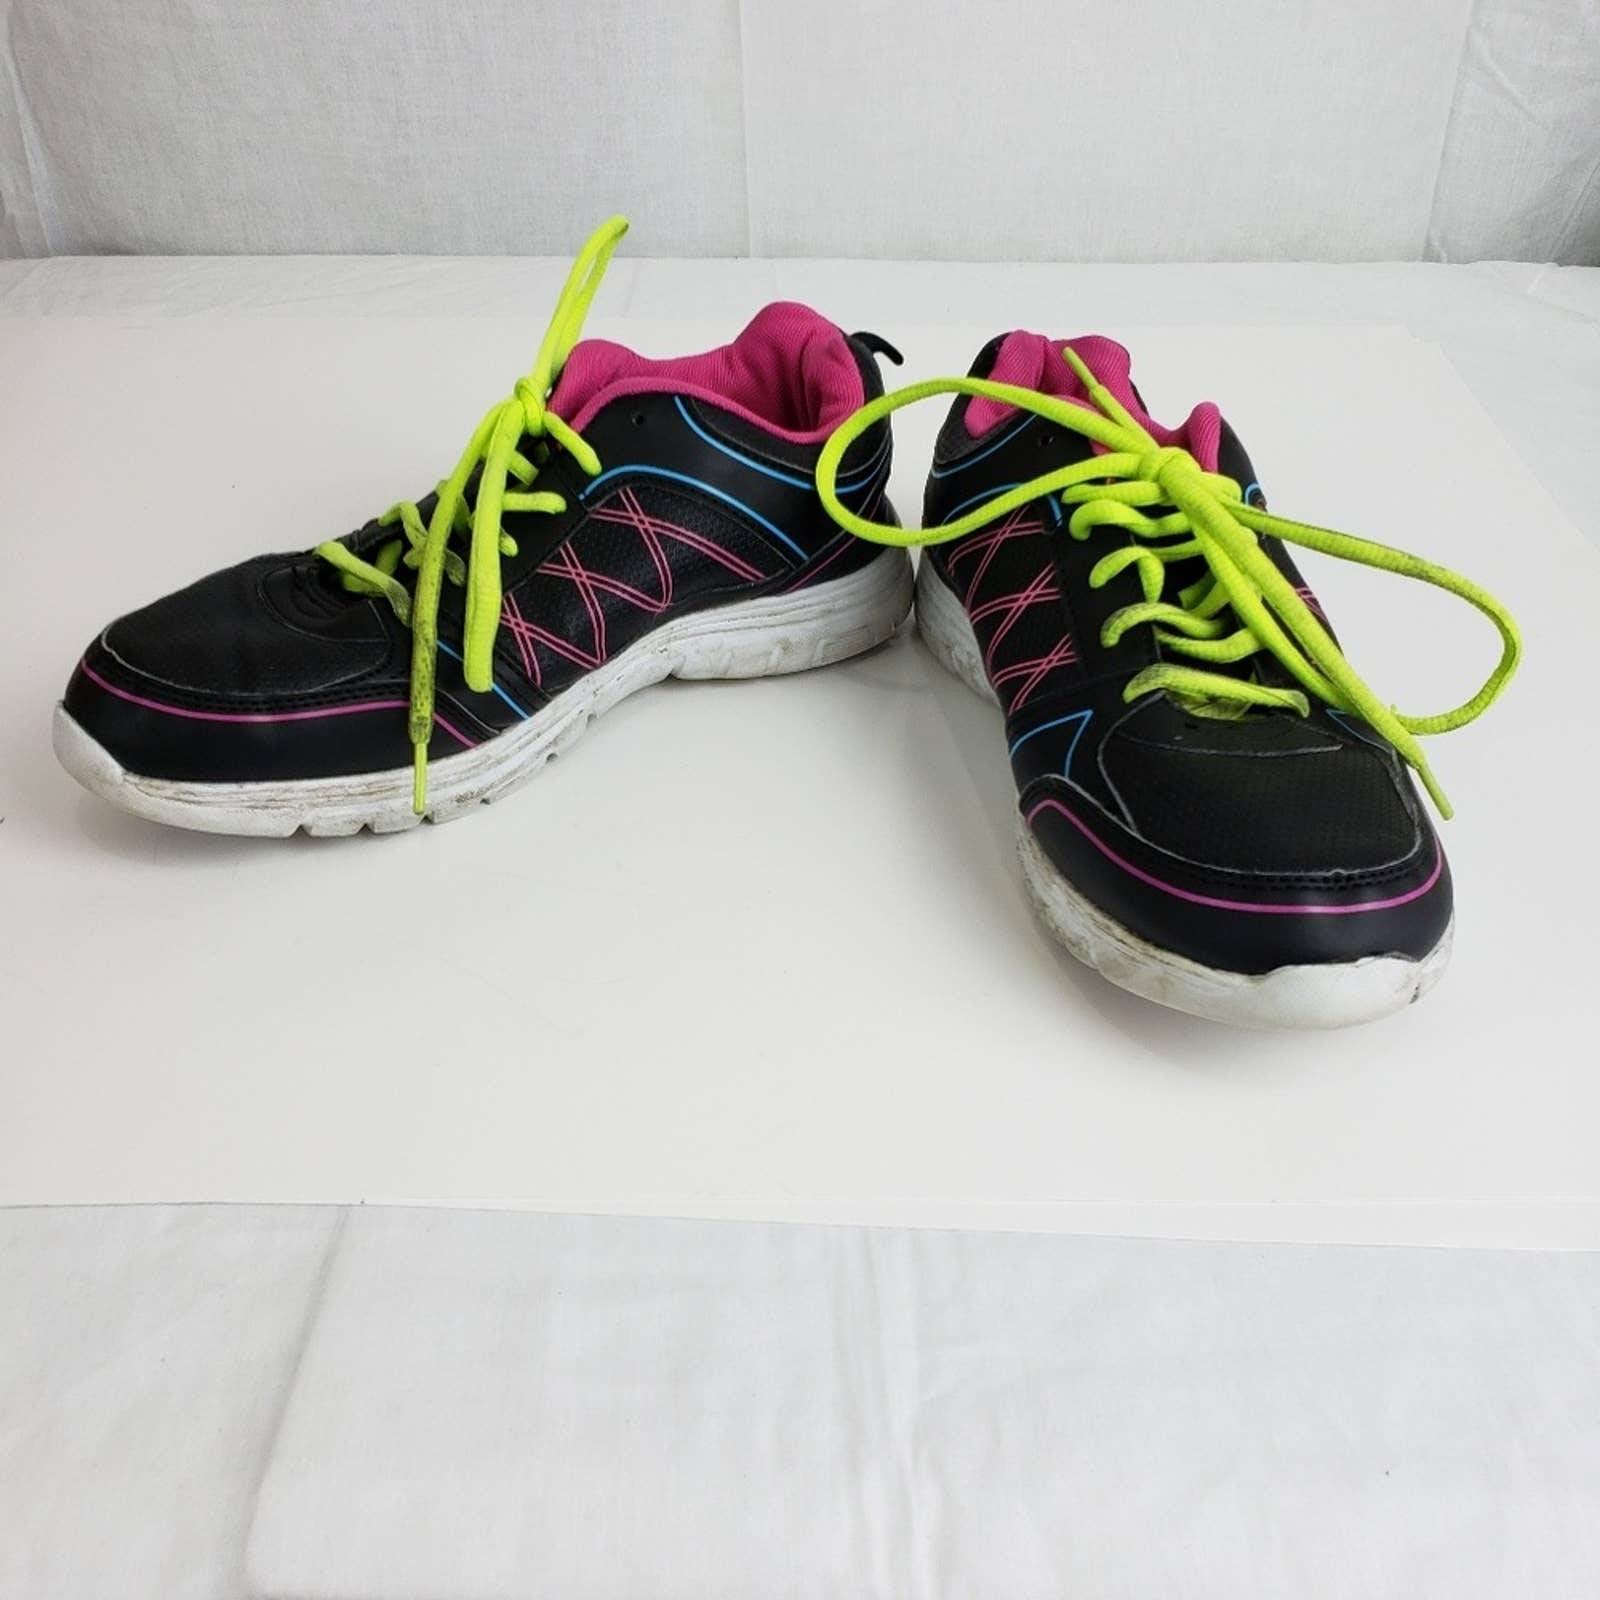 Shoe size 9.5